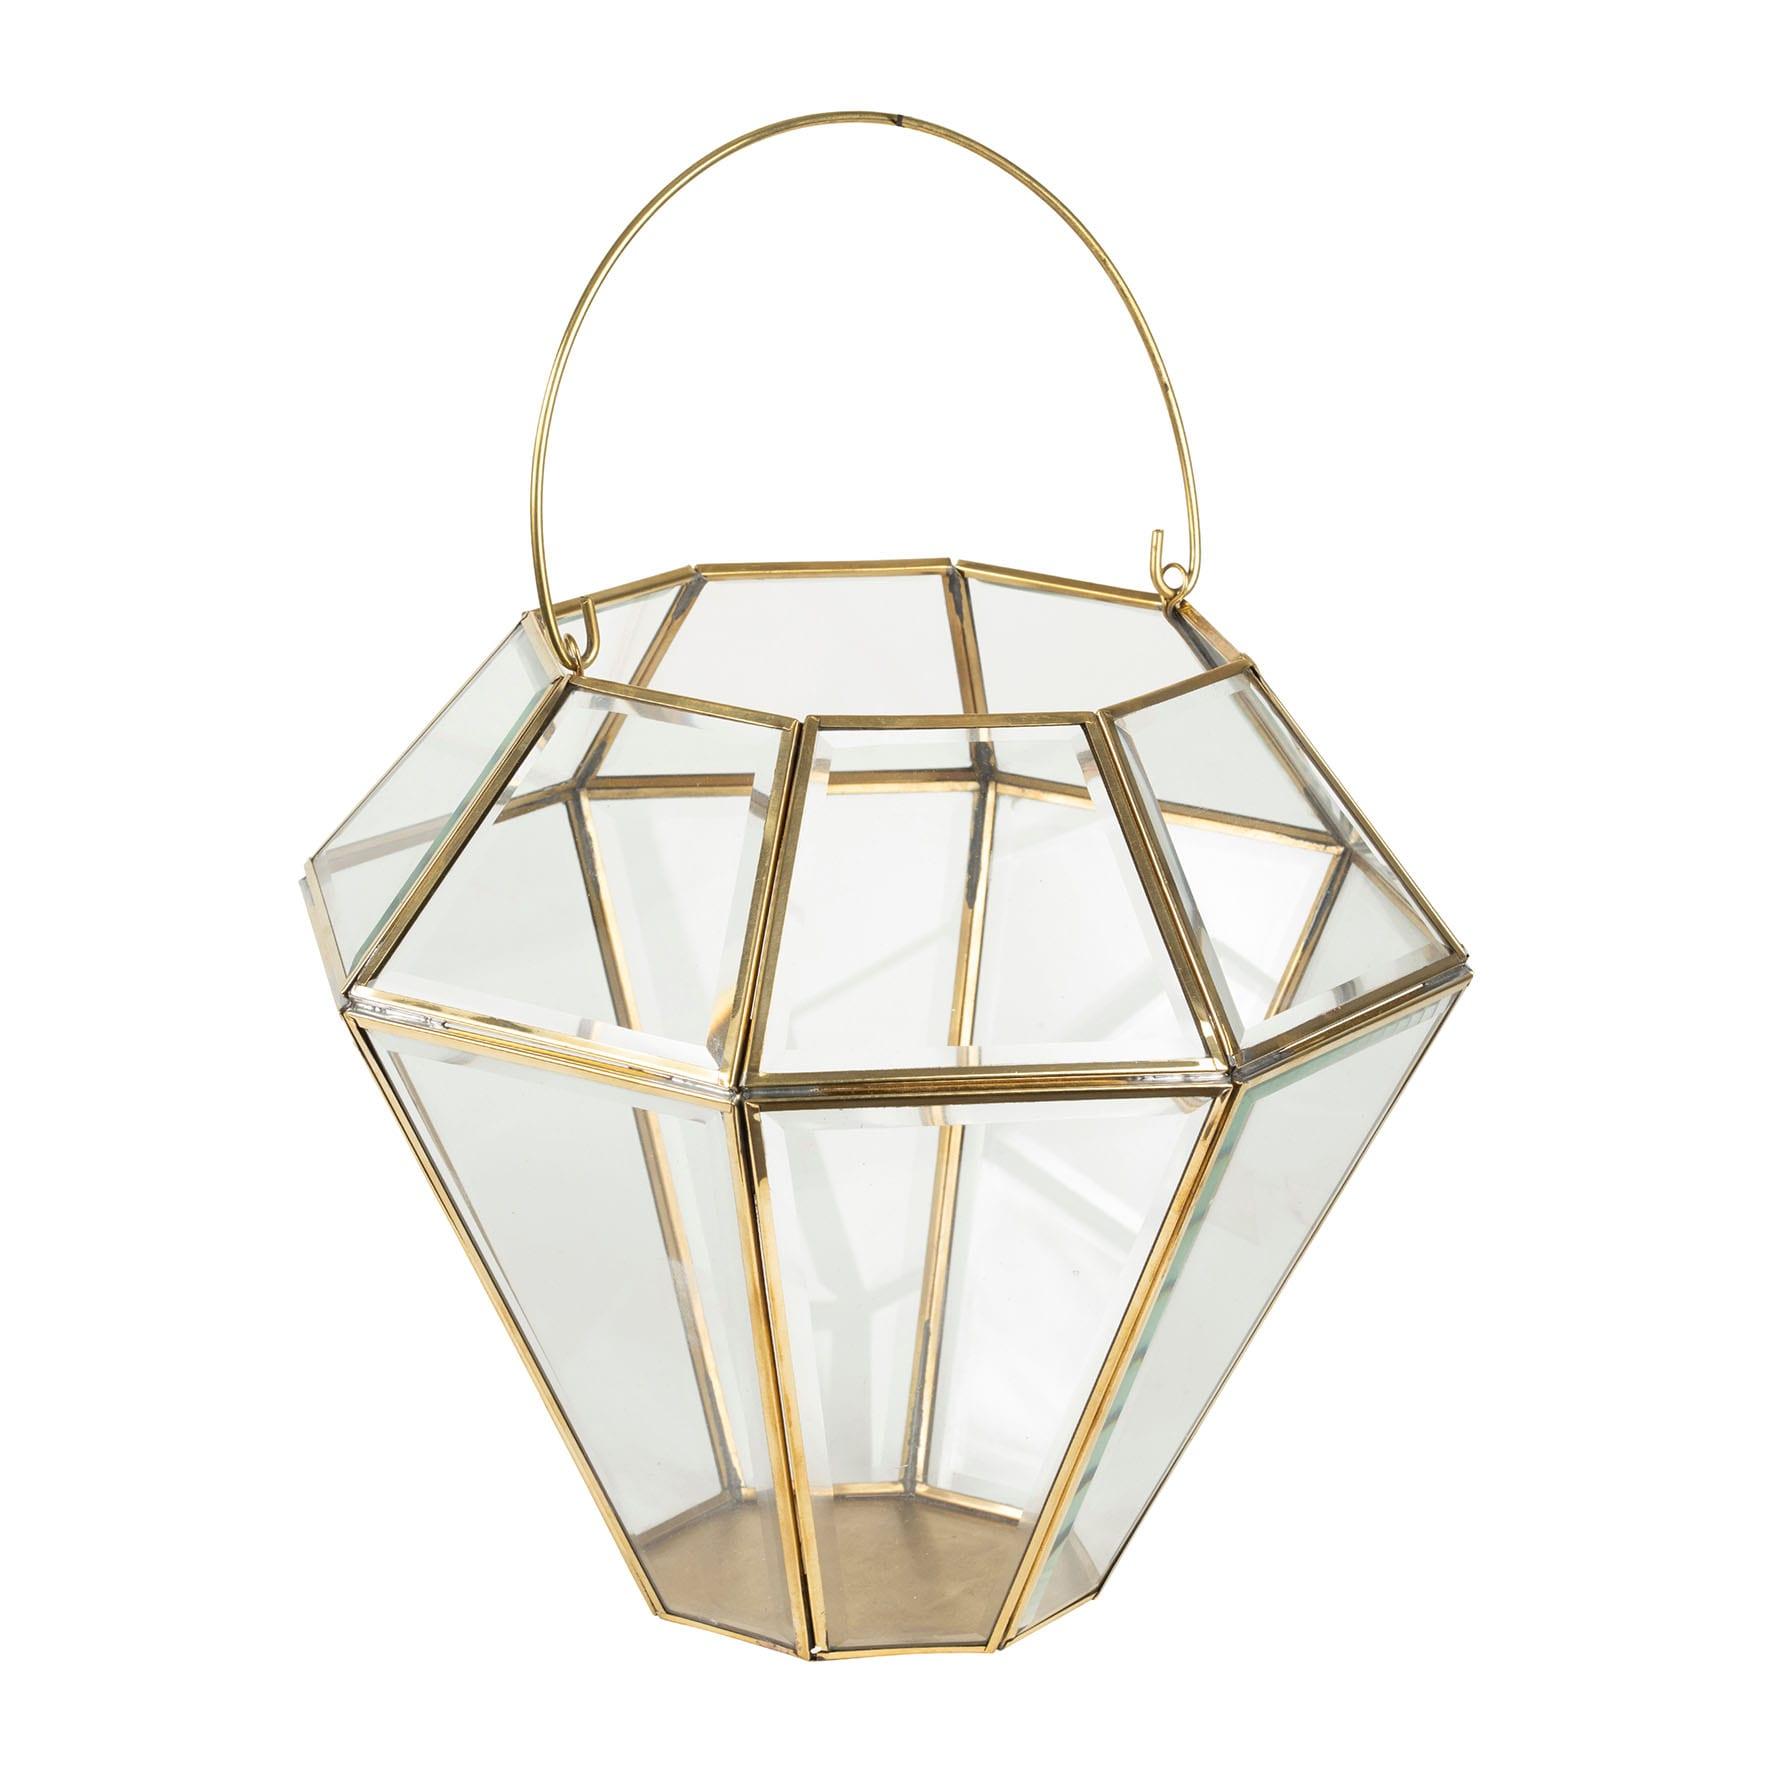 Lanterna porta candela con gancio – Bordo dorato